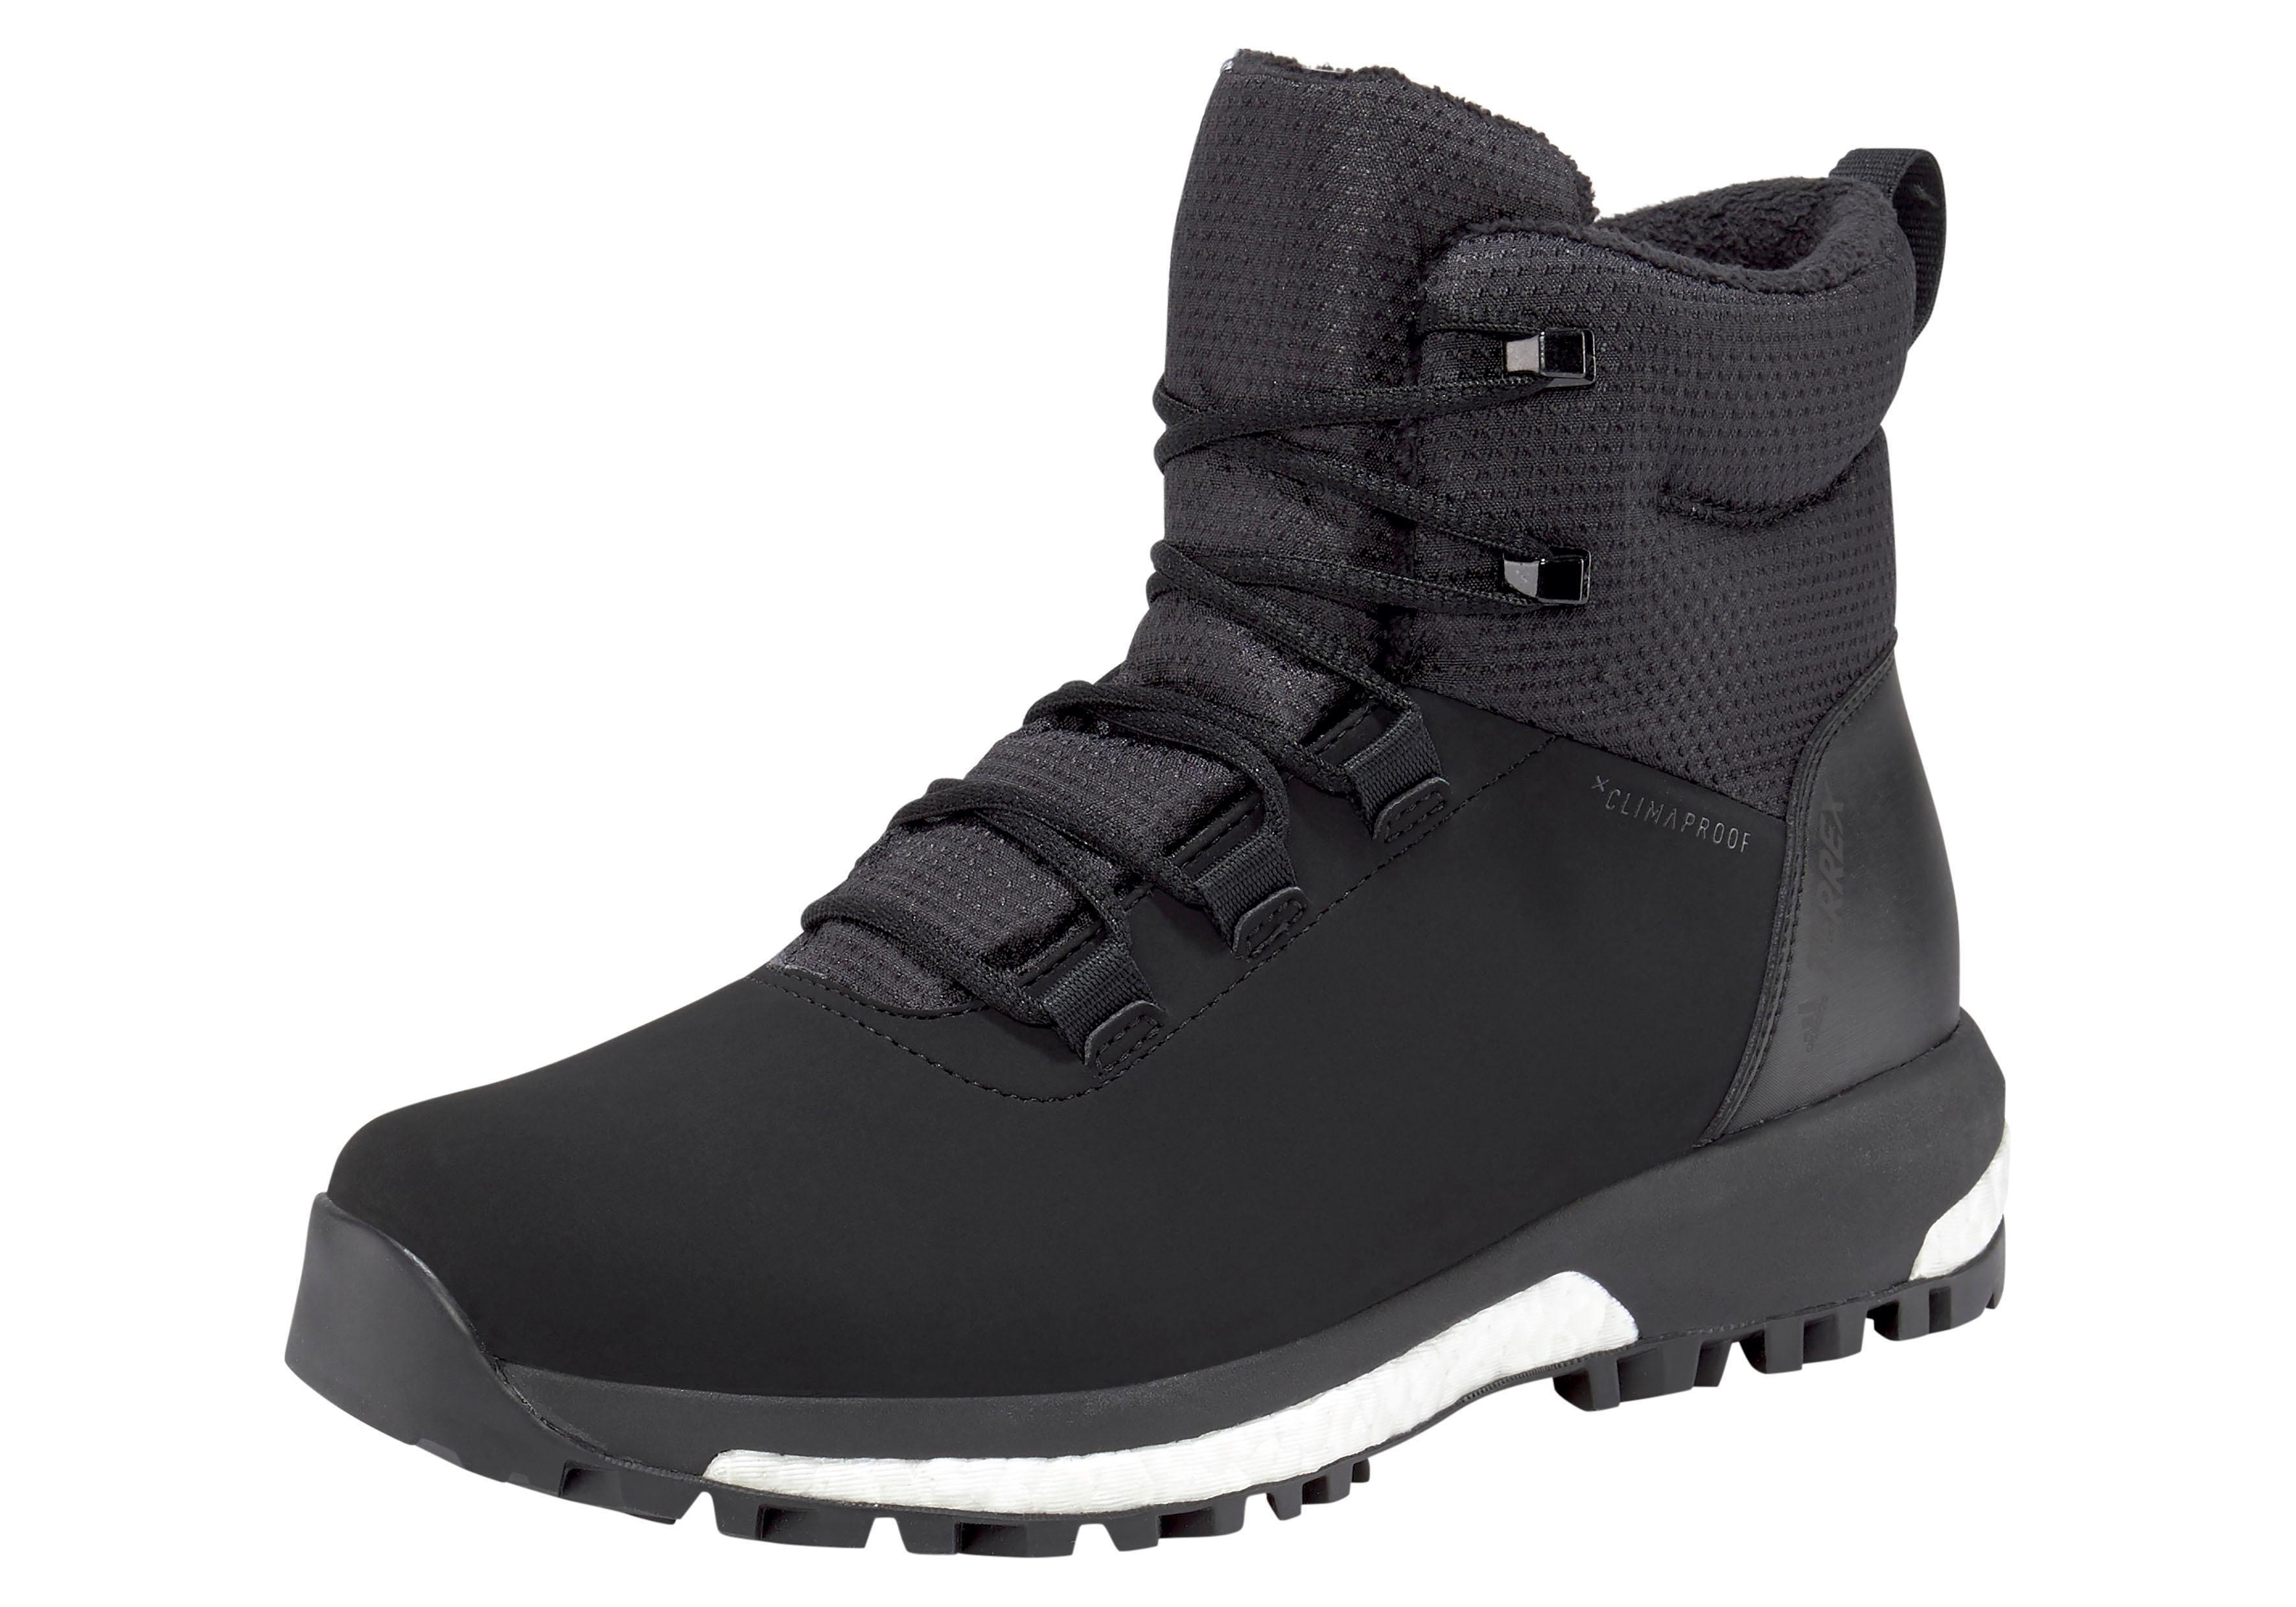 adidas TERREX wandelschoenen TERREX PATHMAKER URBAN COLD.RDY RAIN.RDY WOMENS Waterdicht nu online bestellen